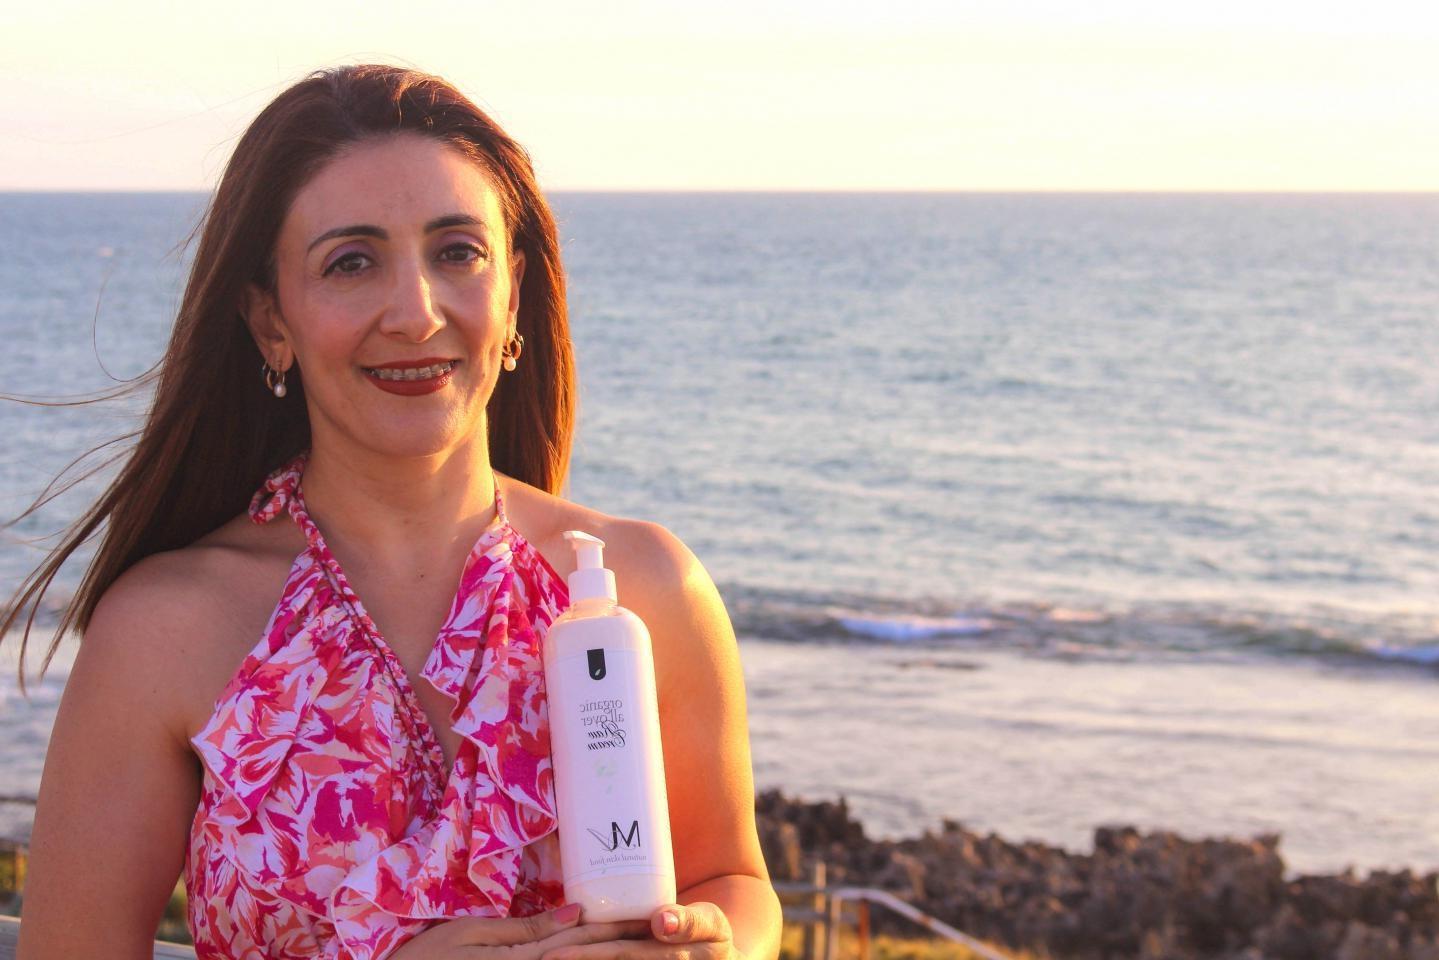 Perth Beauty Manufacturer Marina Ambrosia celebrates record sales -